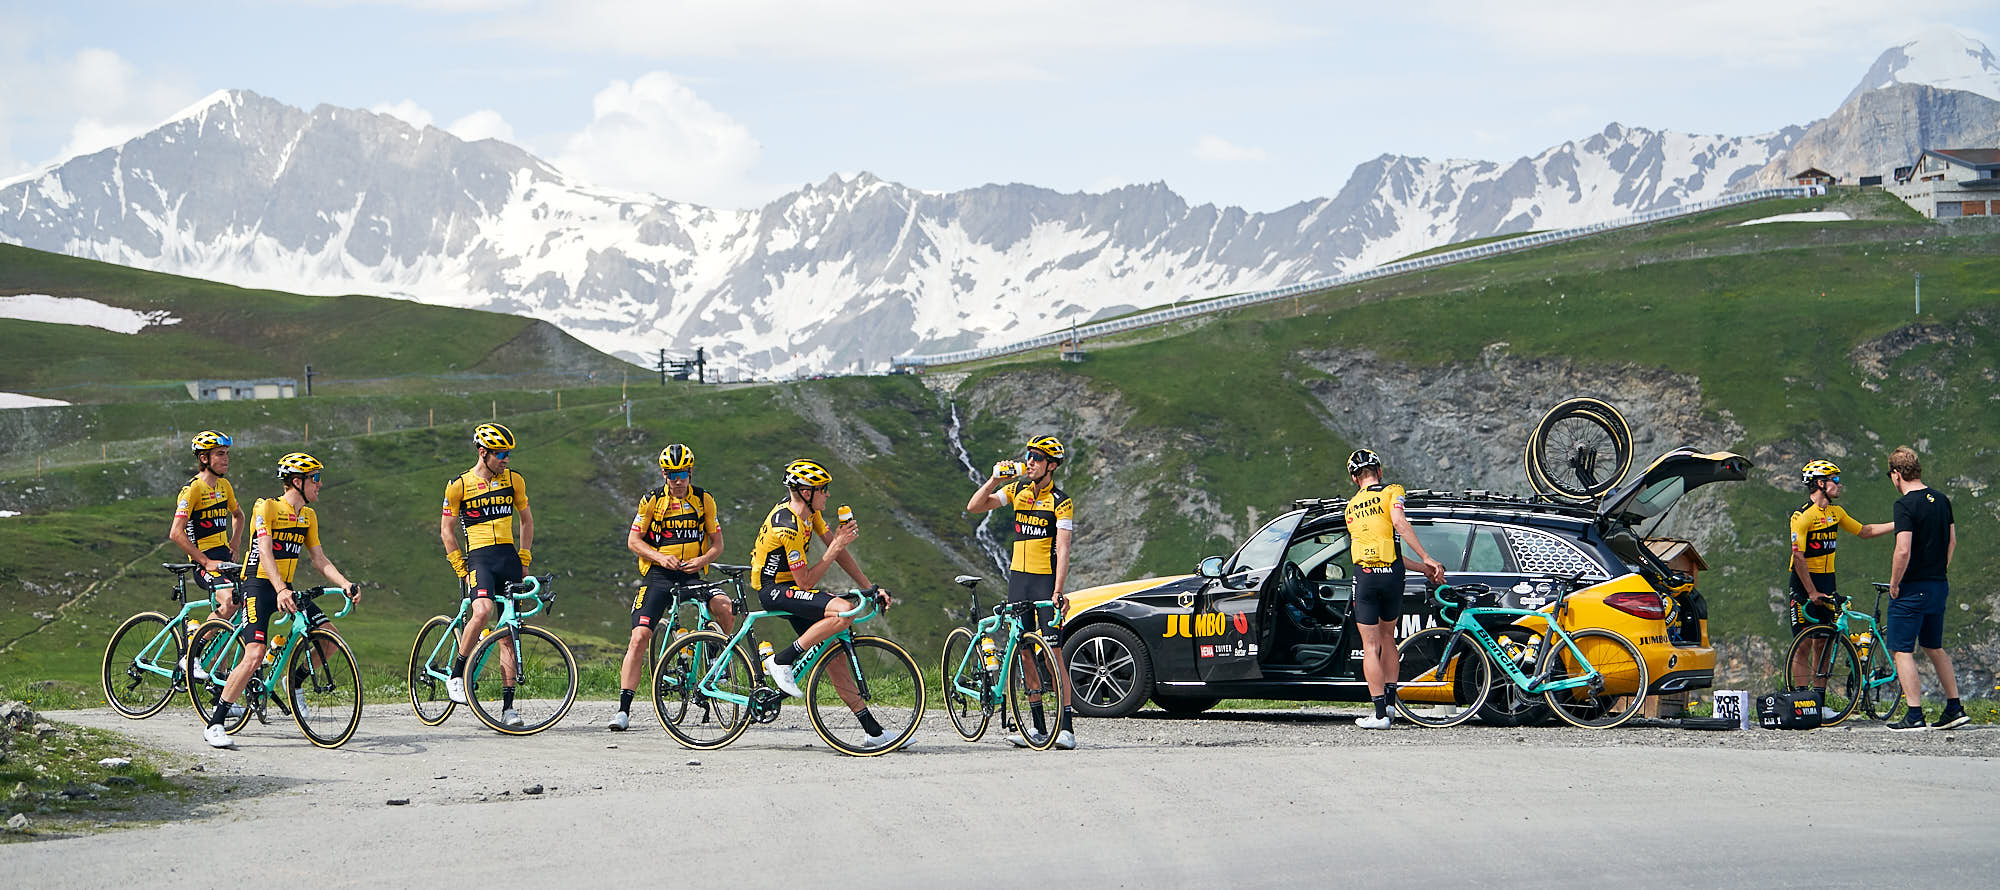 Team Jumbo-Visma riders resting on the Col de l'Iseran